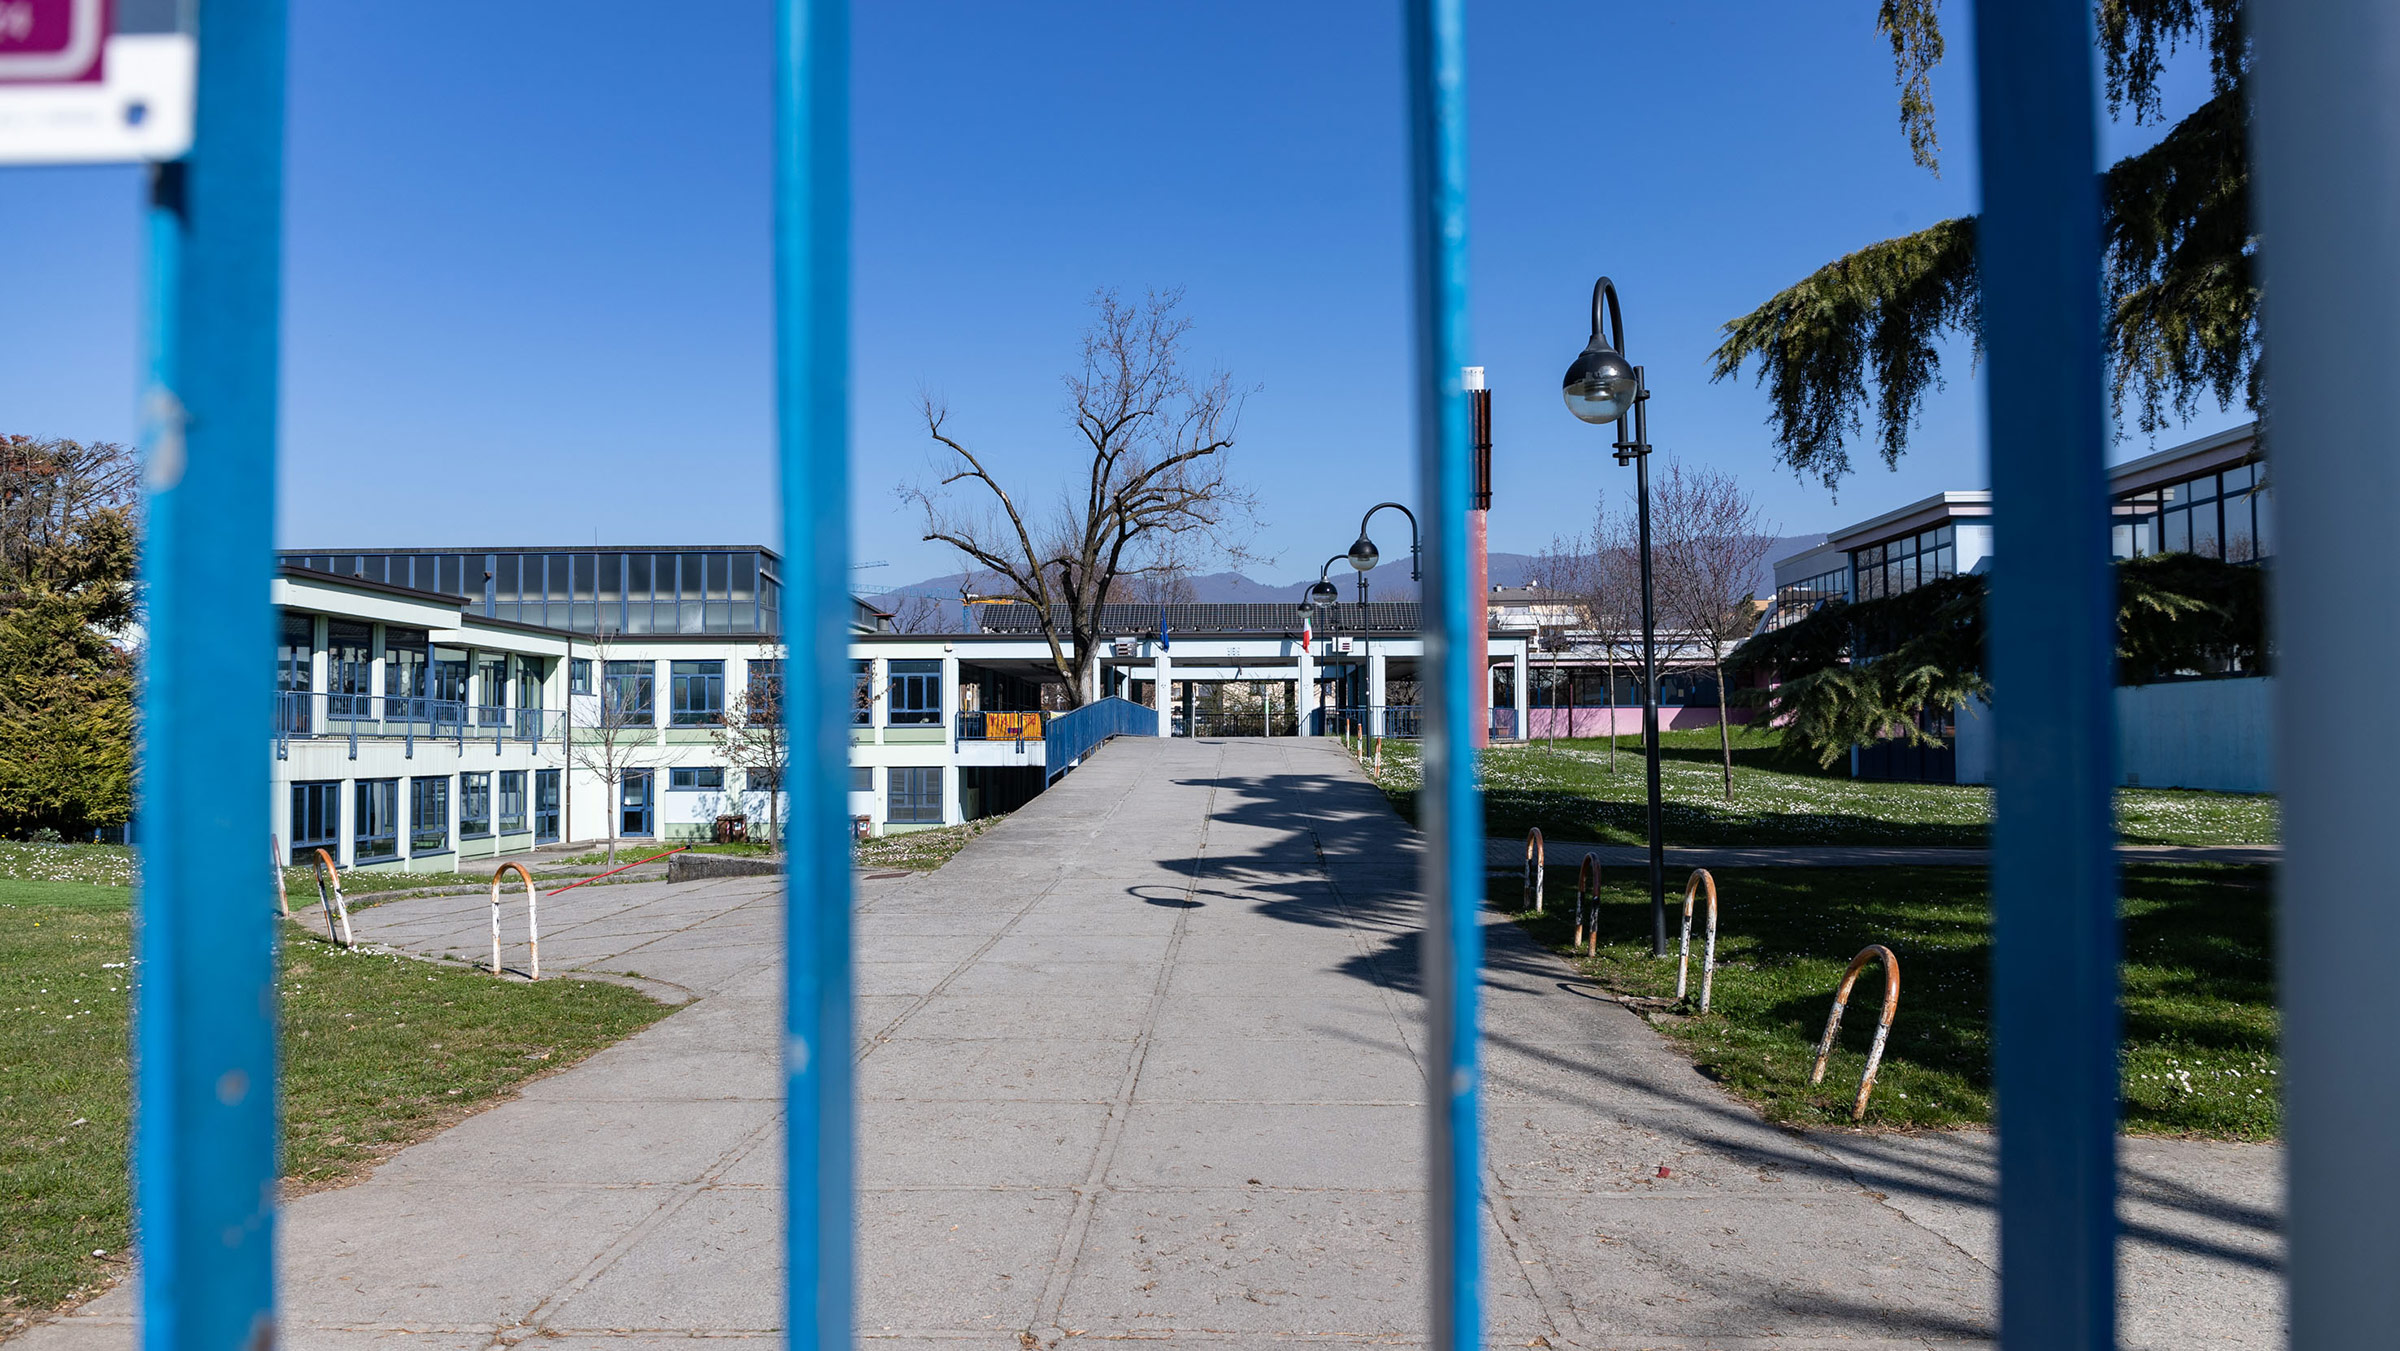 A closed school is seen in Brescia, Italy, on March 1.